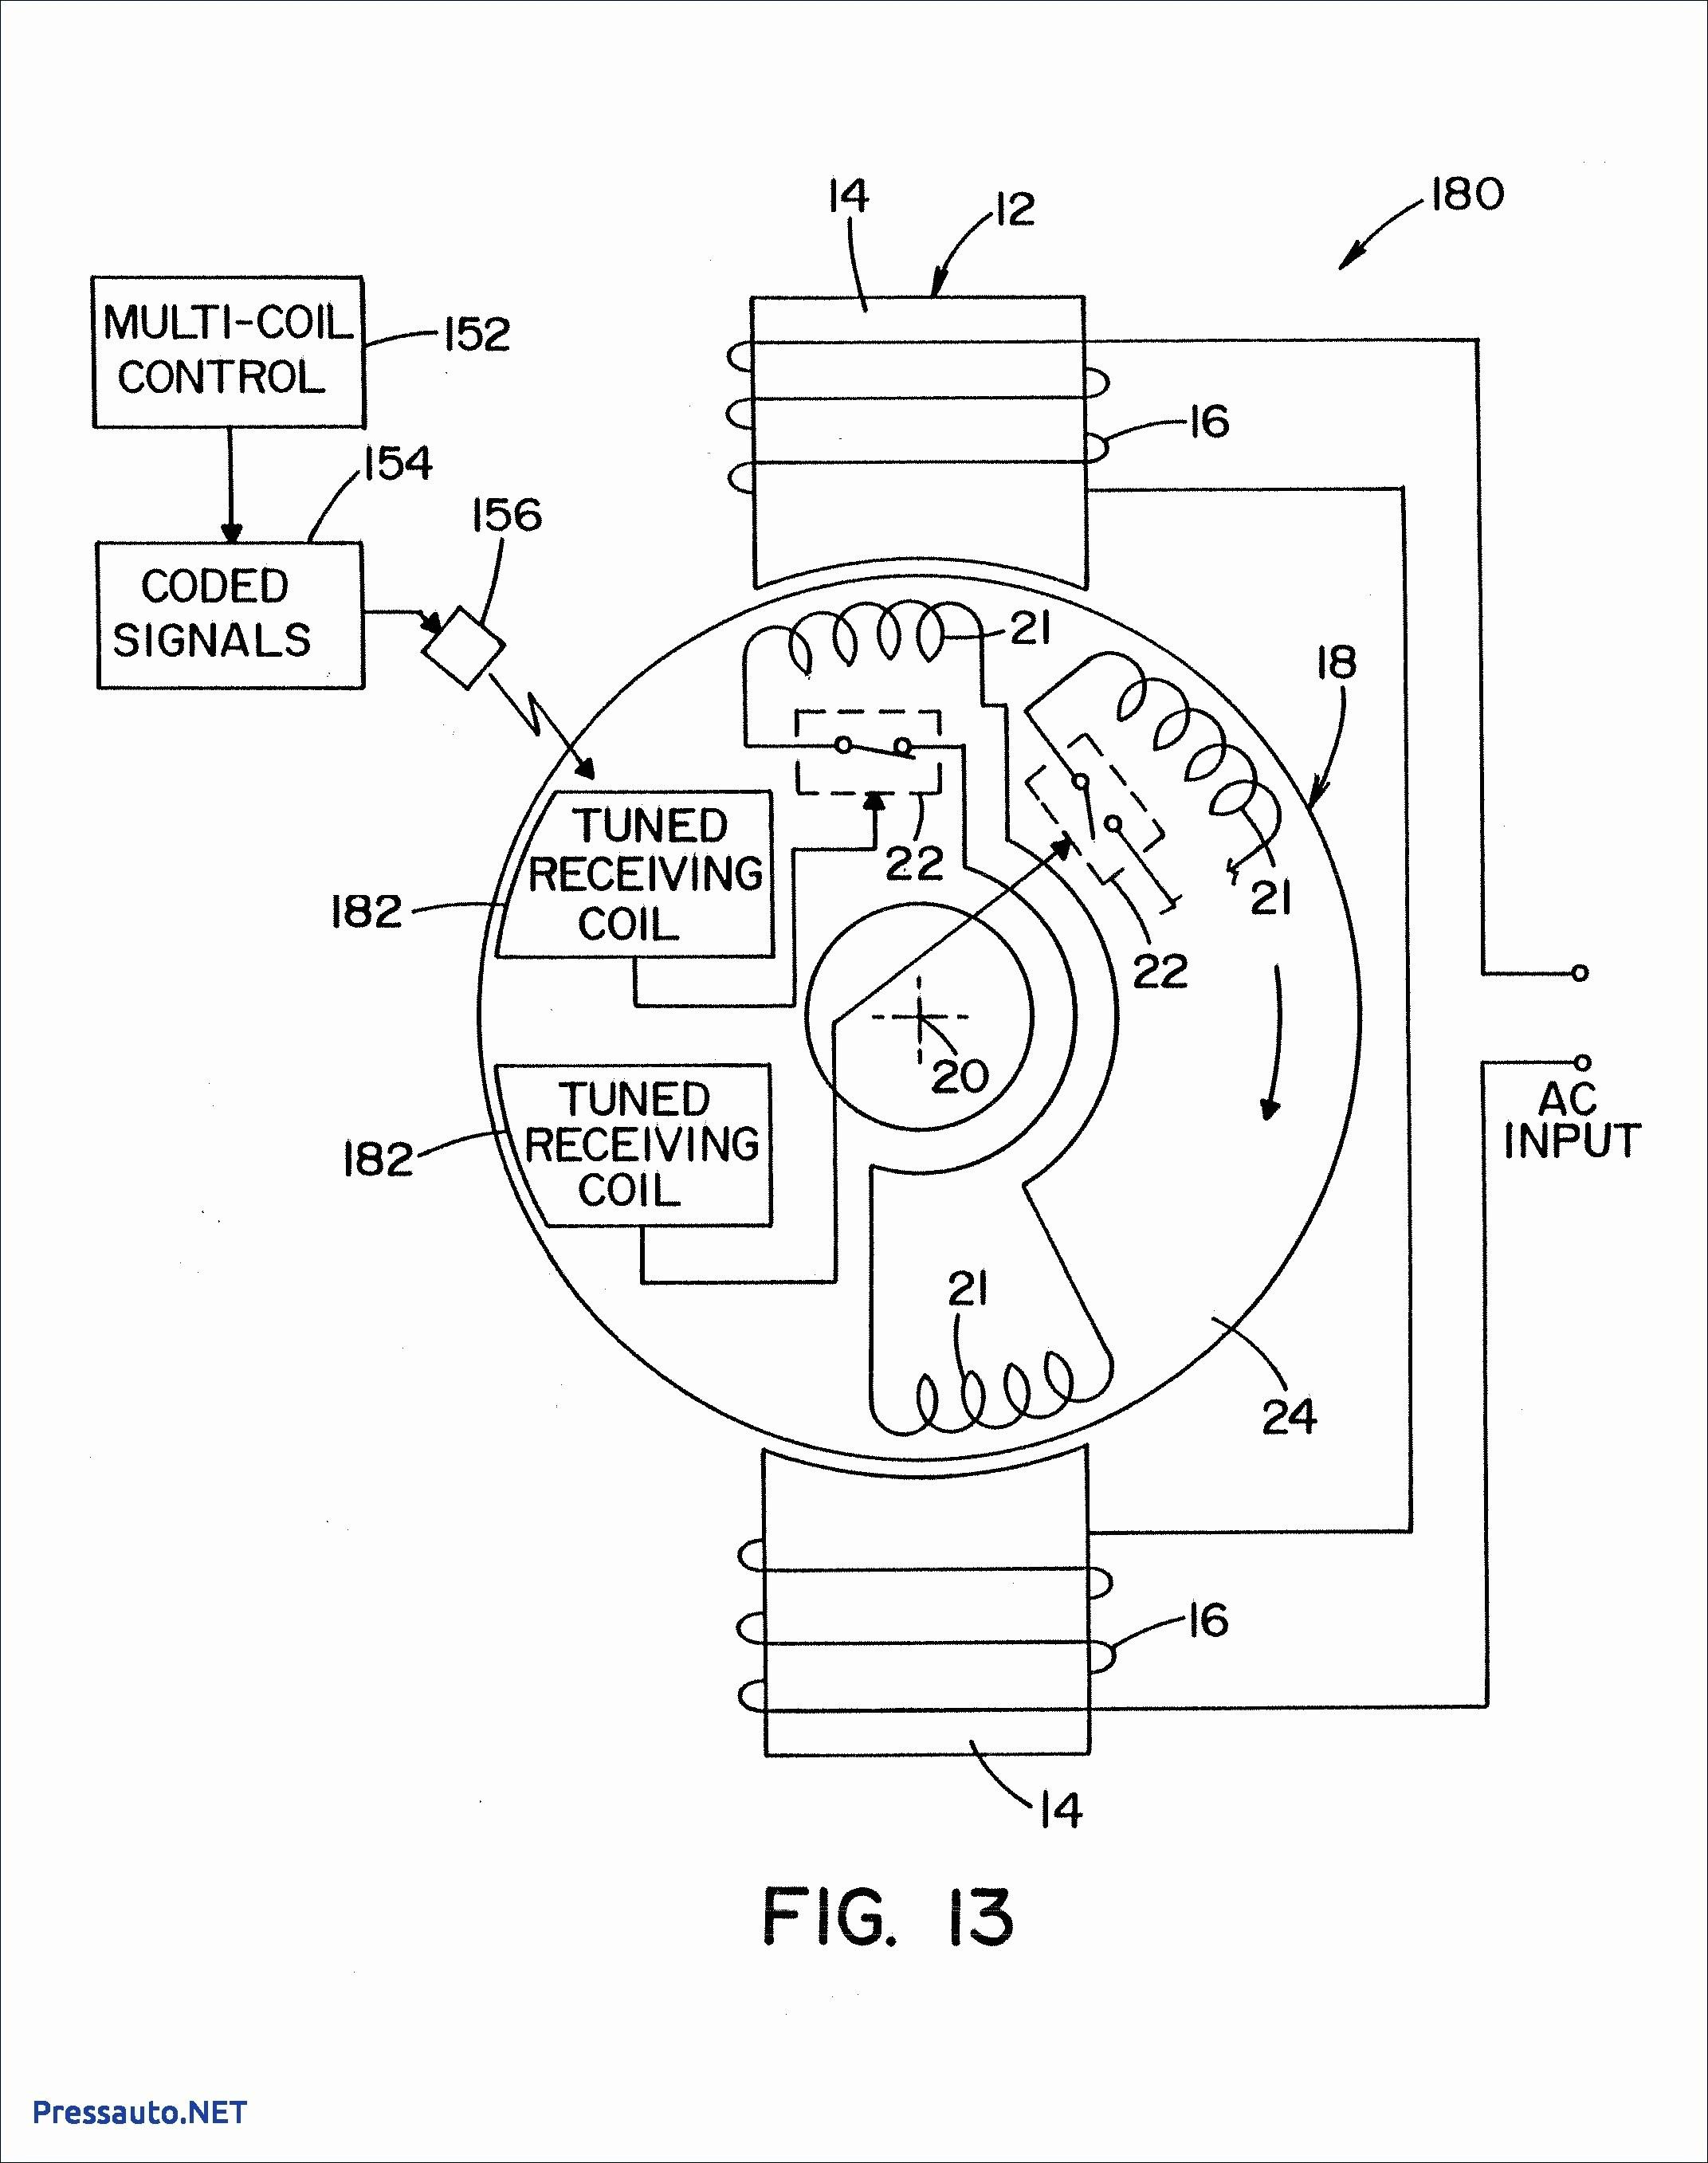 Fantastic Vent Fan Wiring Diagram | Manual E-Books - Fantastic Vent Wiring Diagram